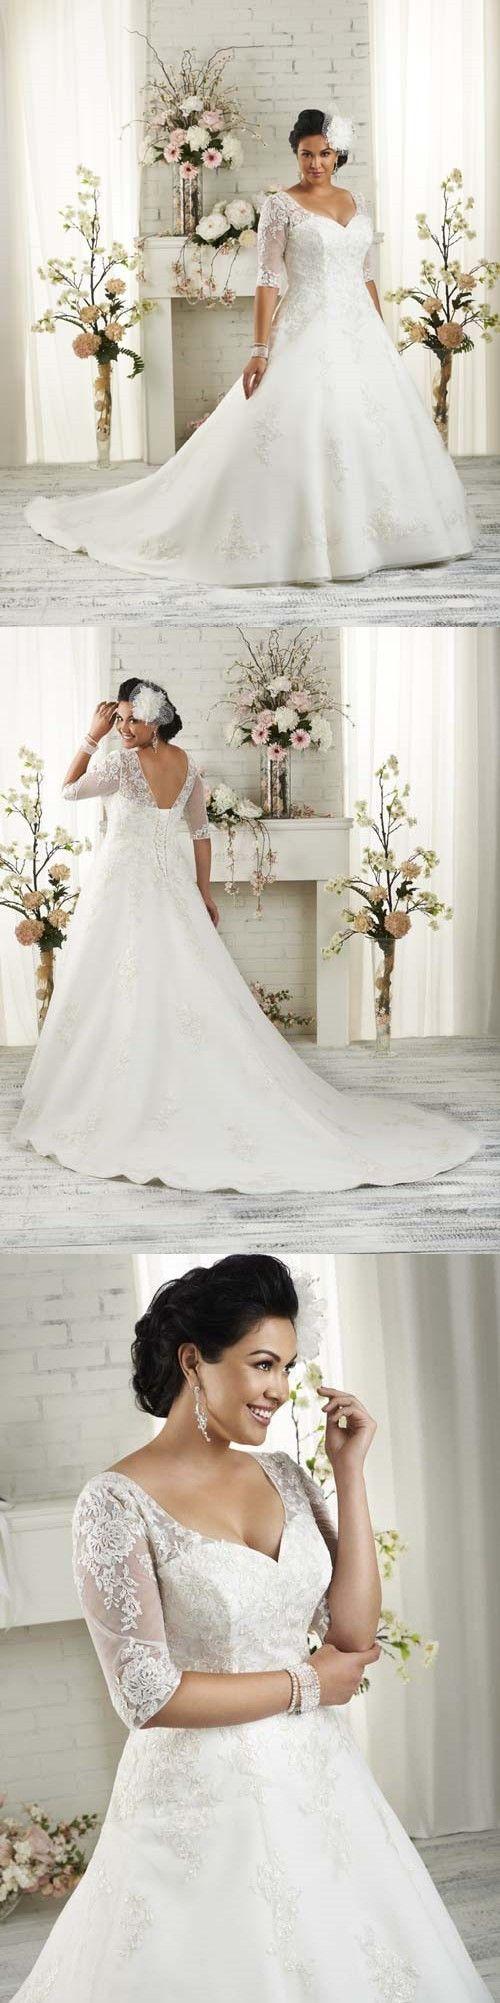 Plus size wedding dresses wedding dresshalf sleeves wedding